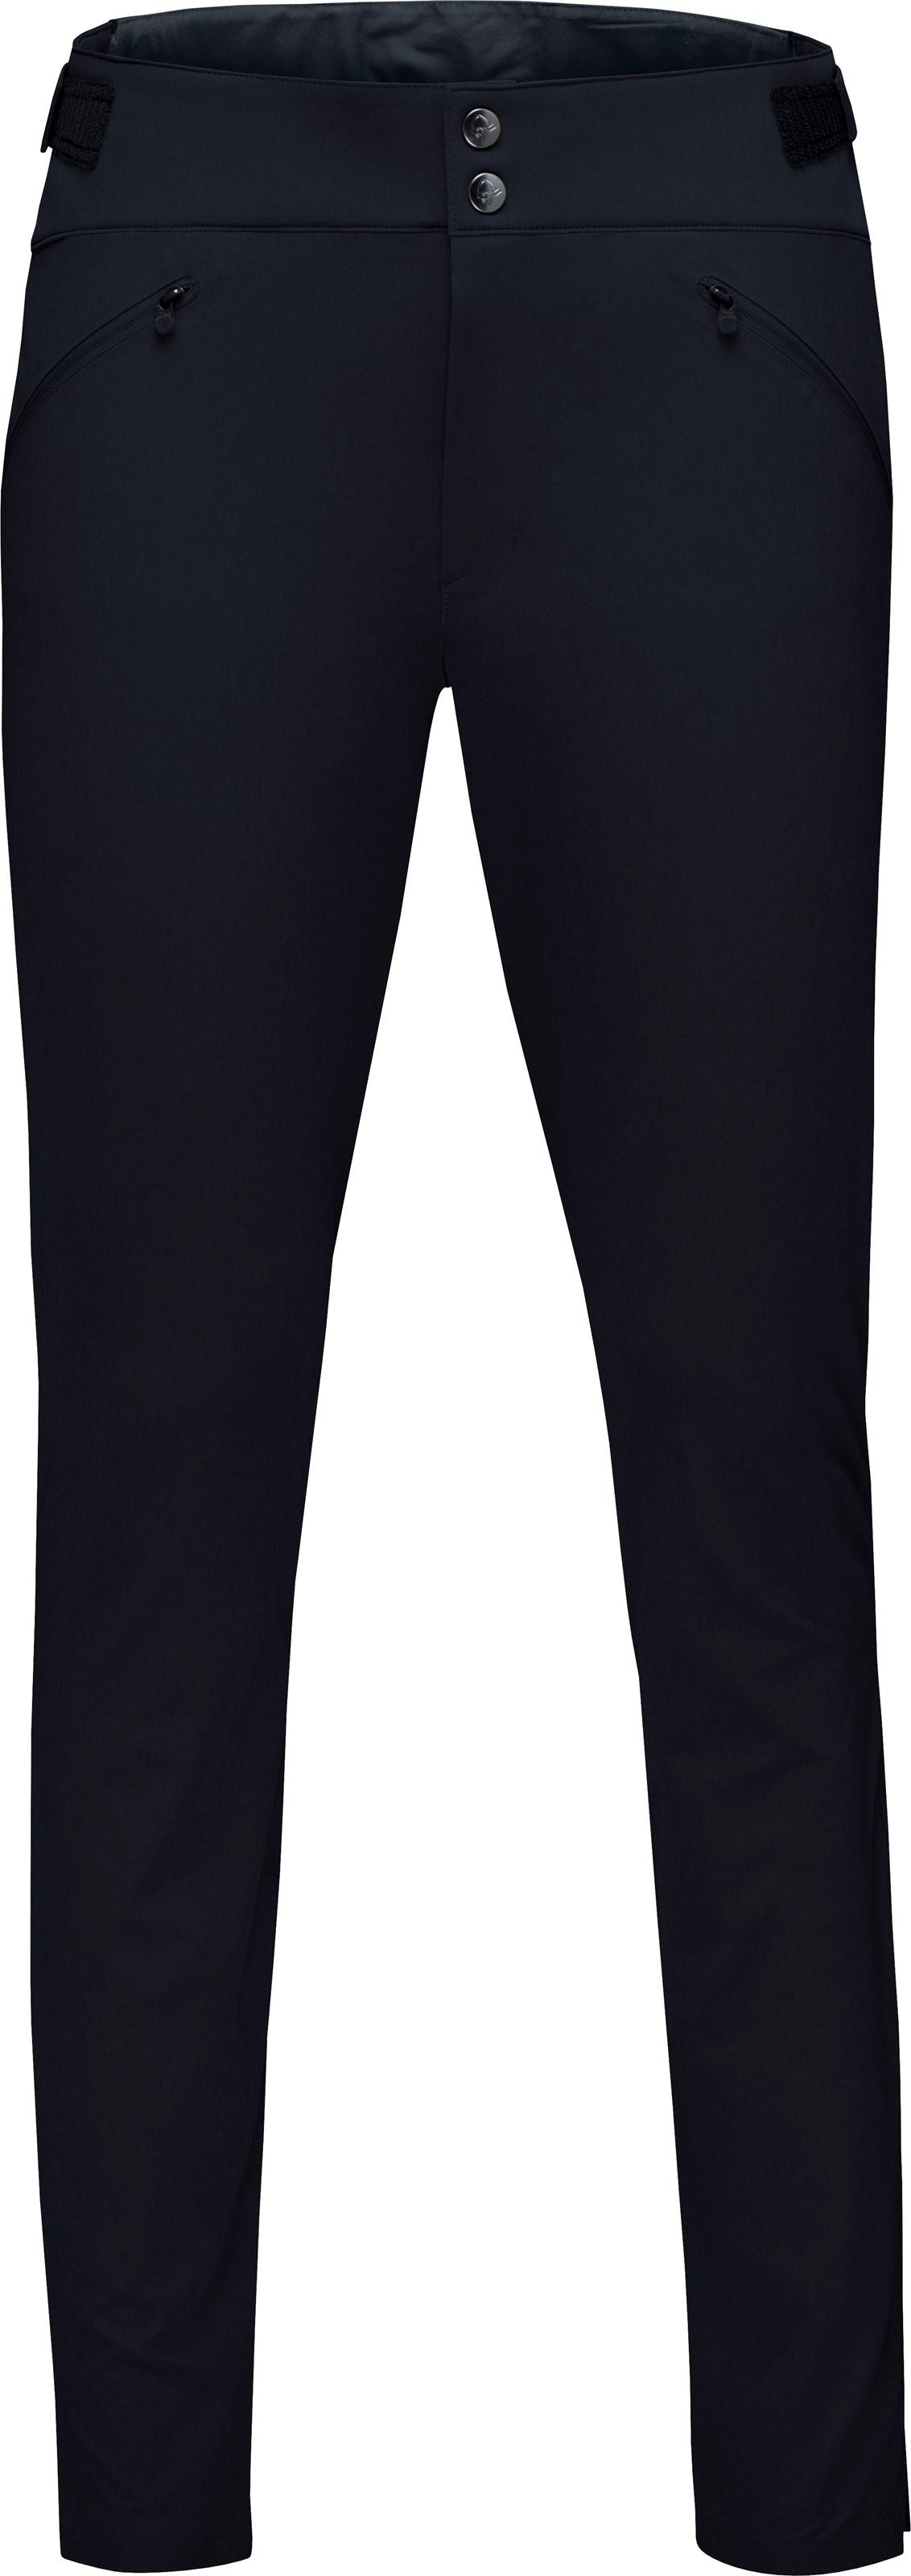 Braasport Norrøna Falketind flex1 Slim Pants